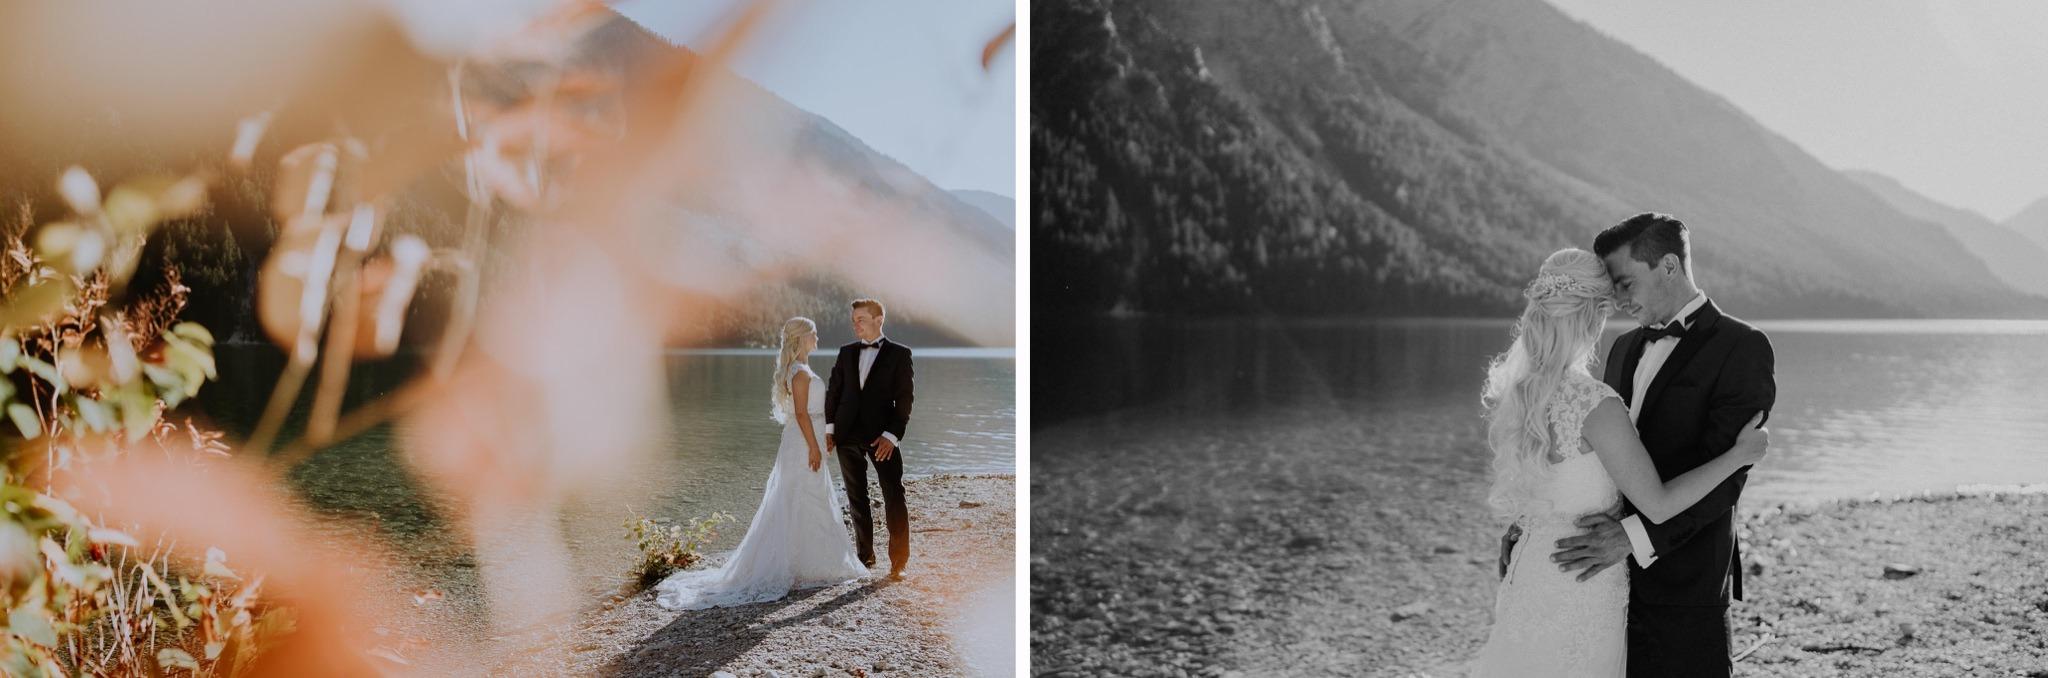 wedding photographer hamilton new zealand 6